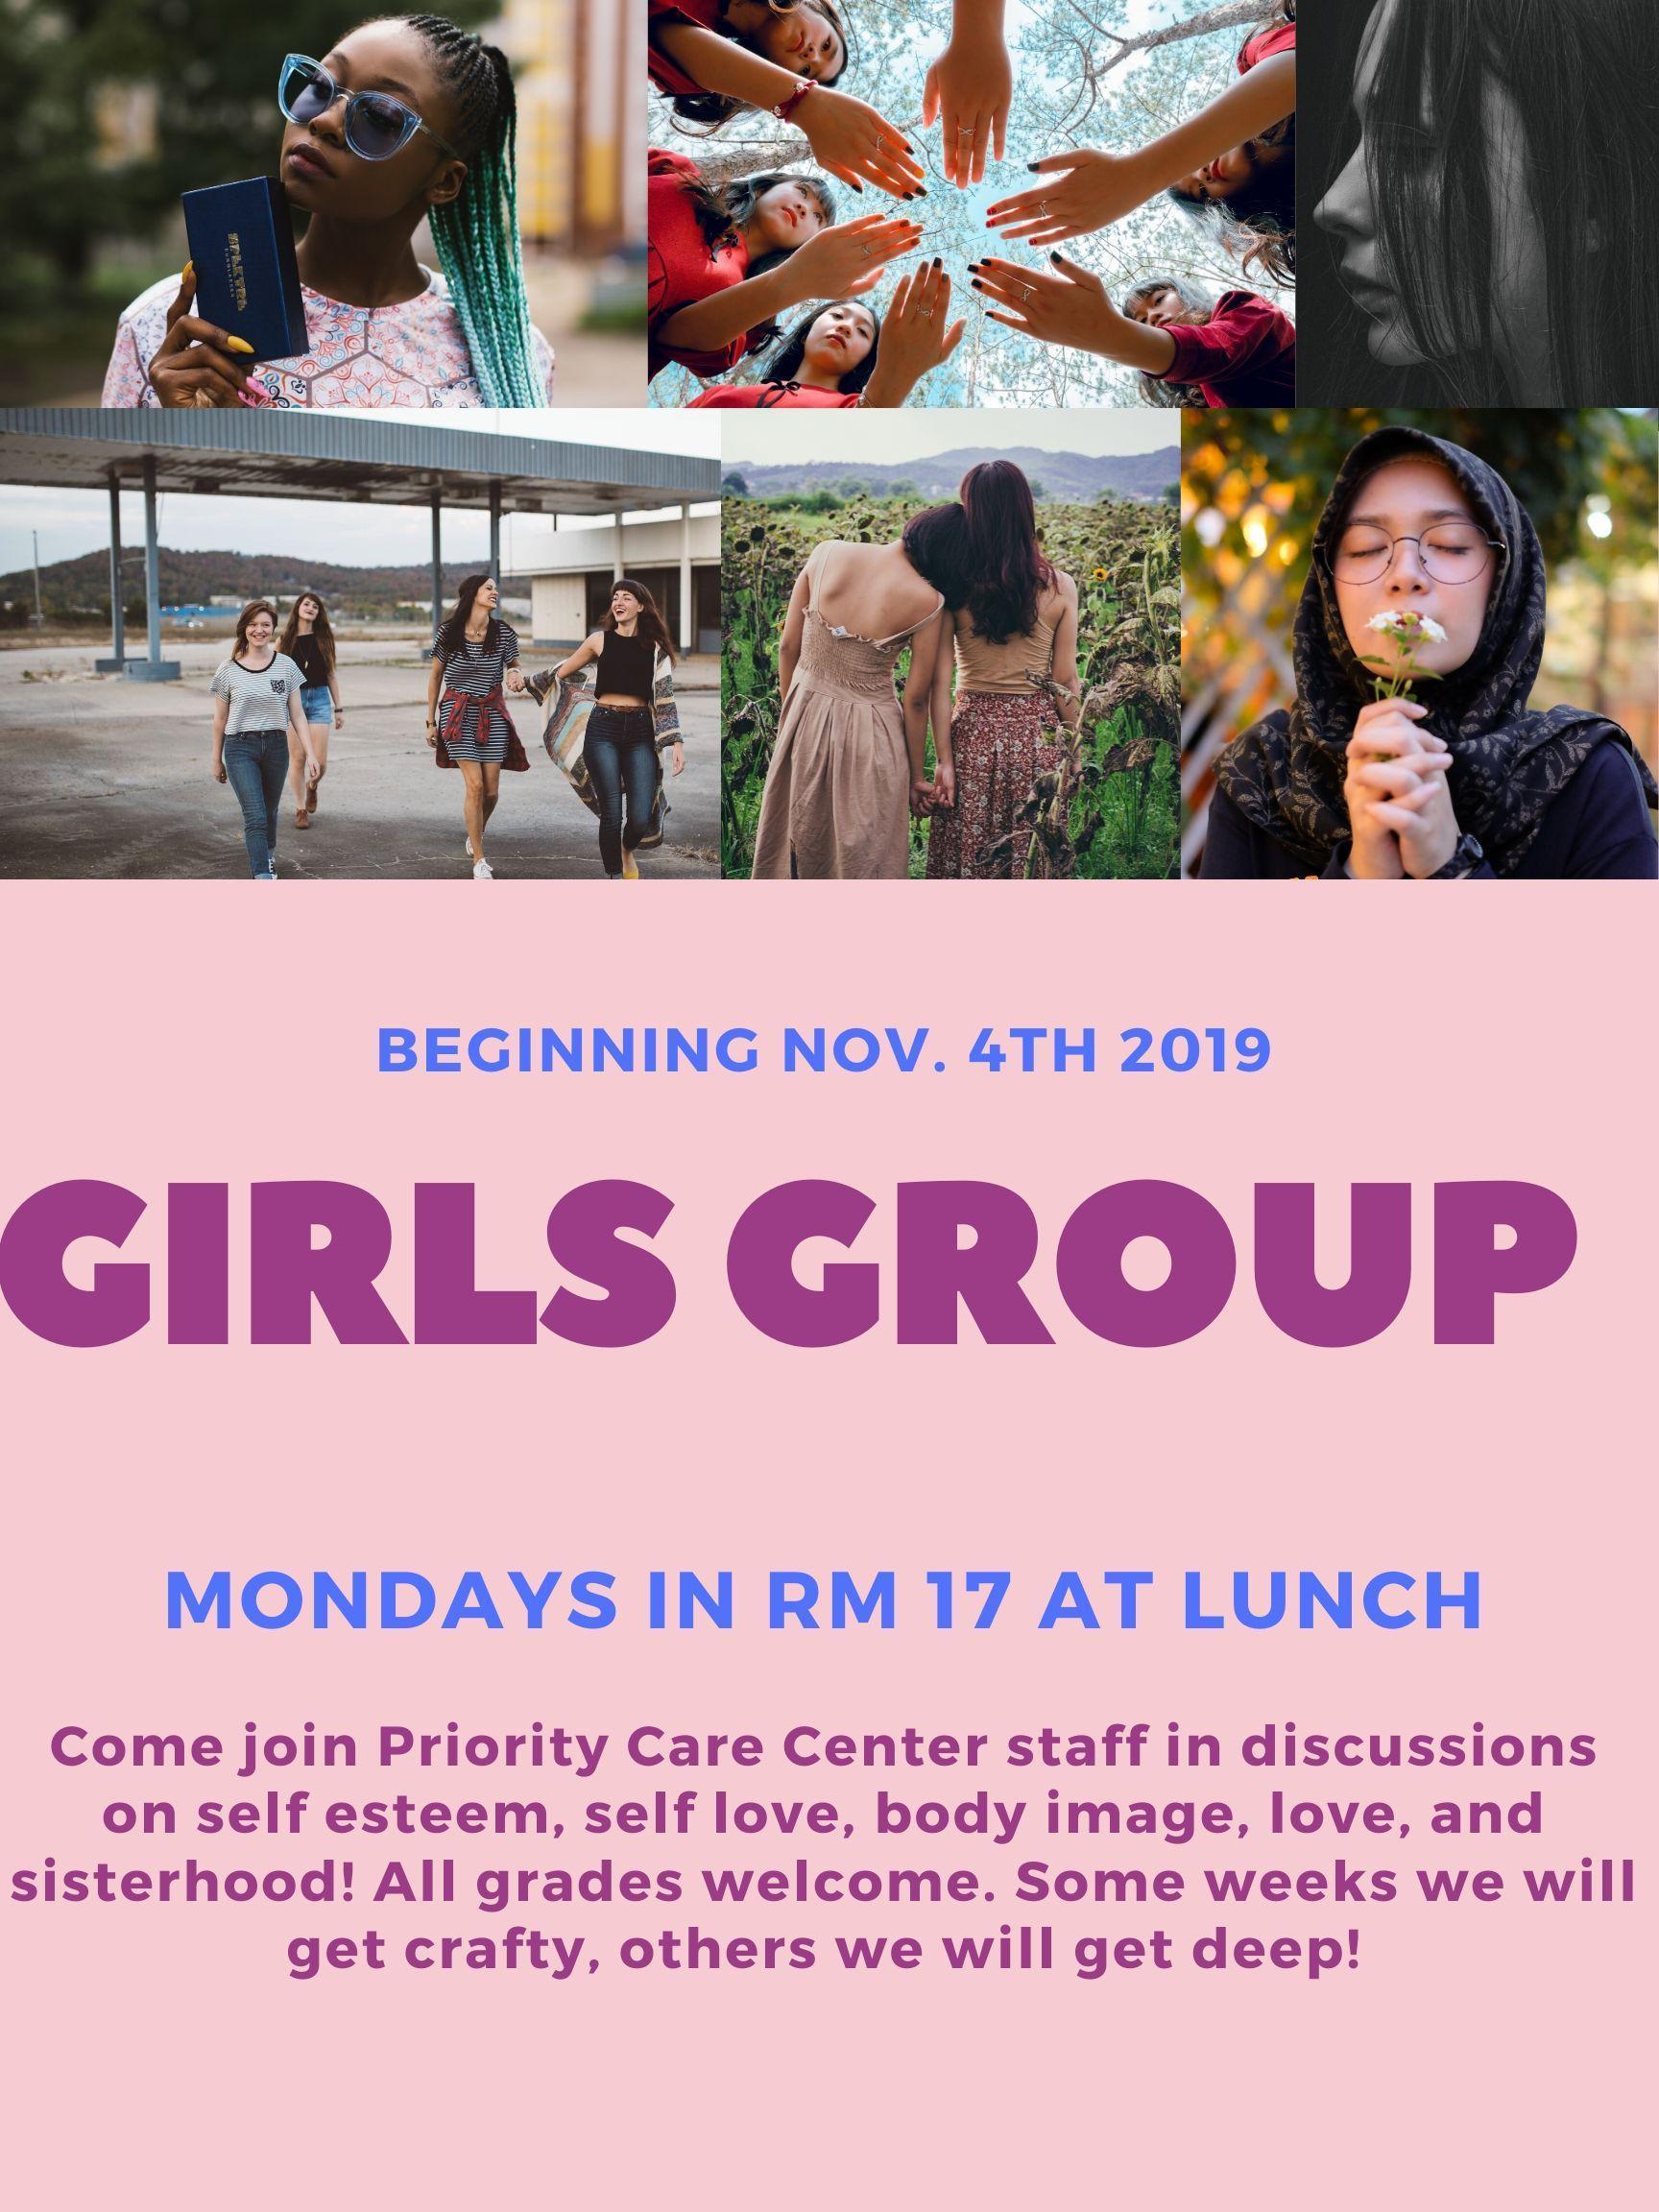 girls group meeting